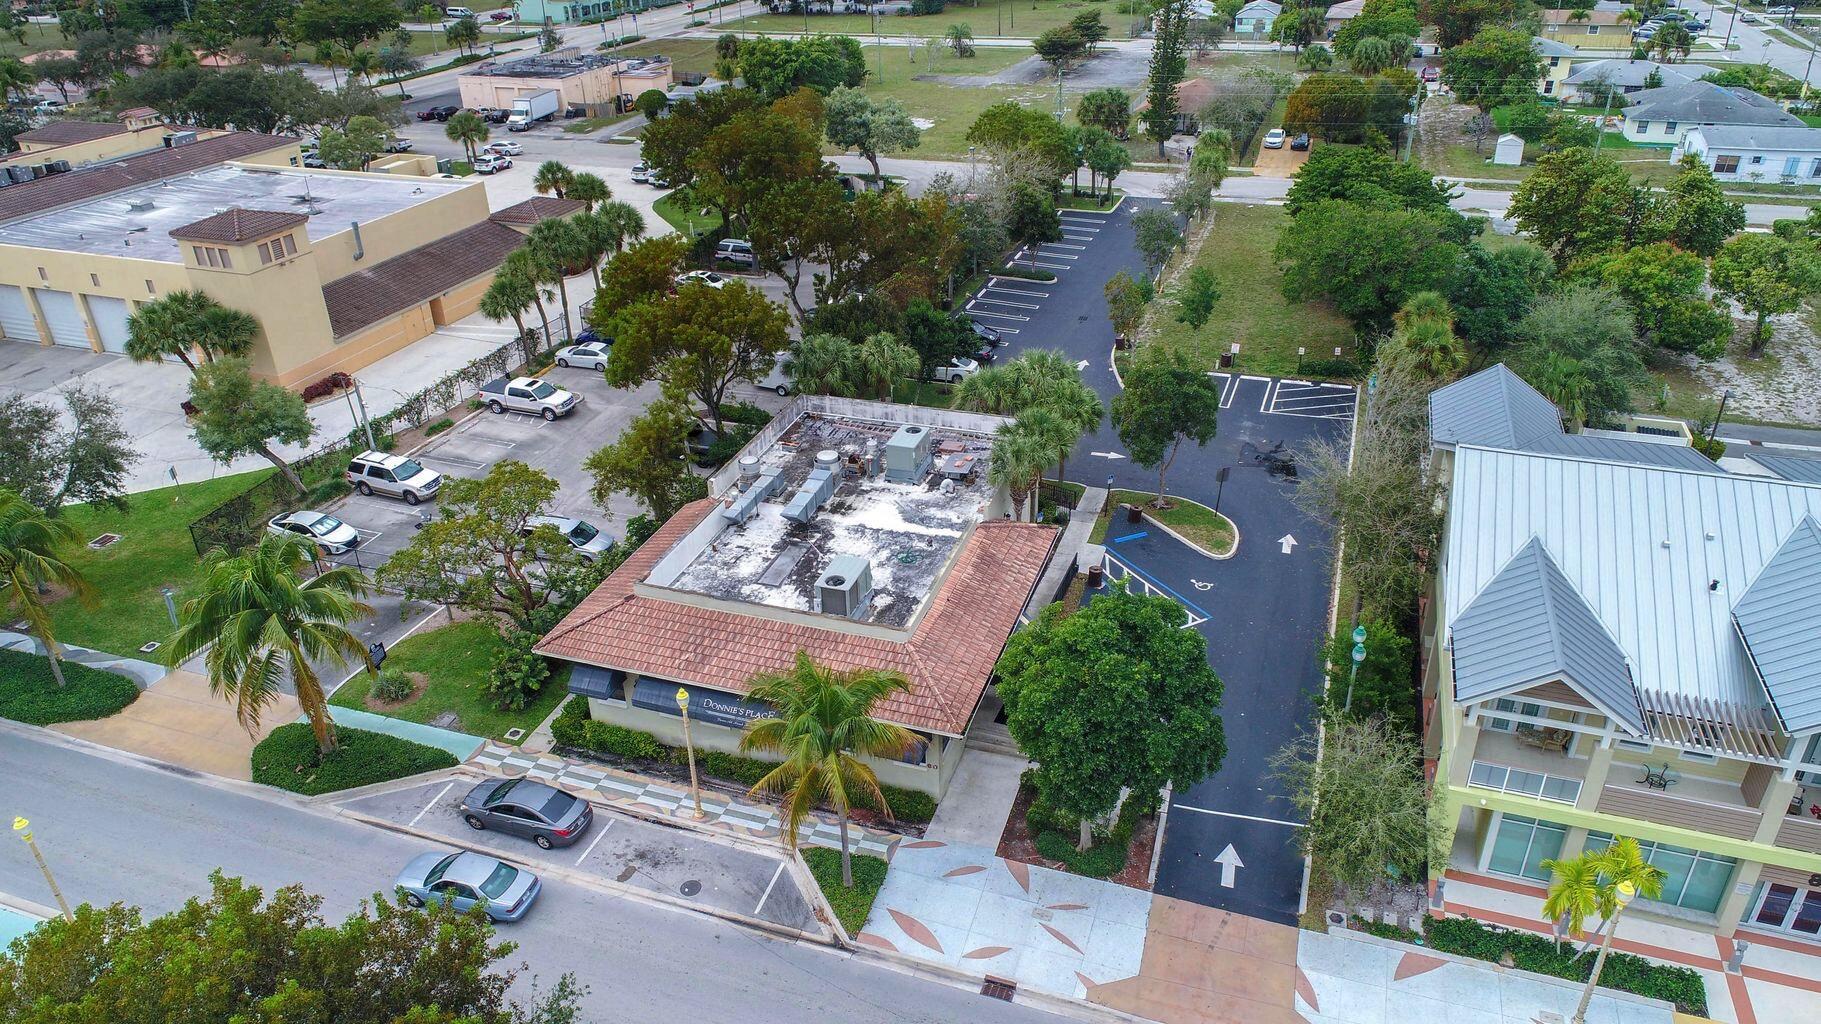 60 5th Avenue, Delray Beach, Florida 33444, ,2 BathroomsBathrooms,Commercial Industrial,For Sale,5th,RX-10708402